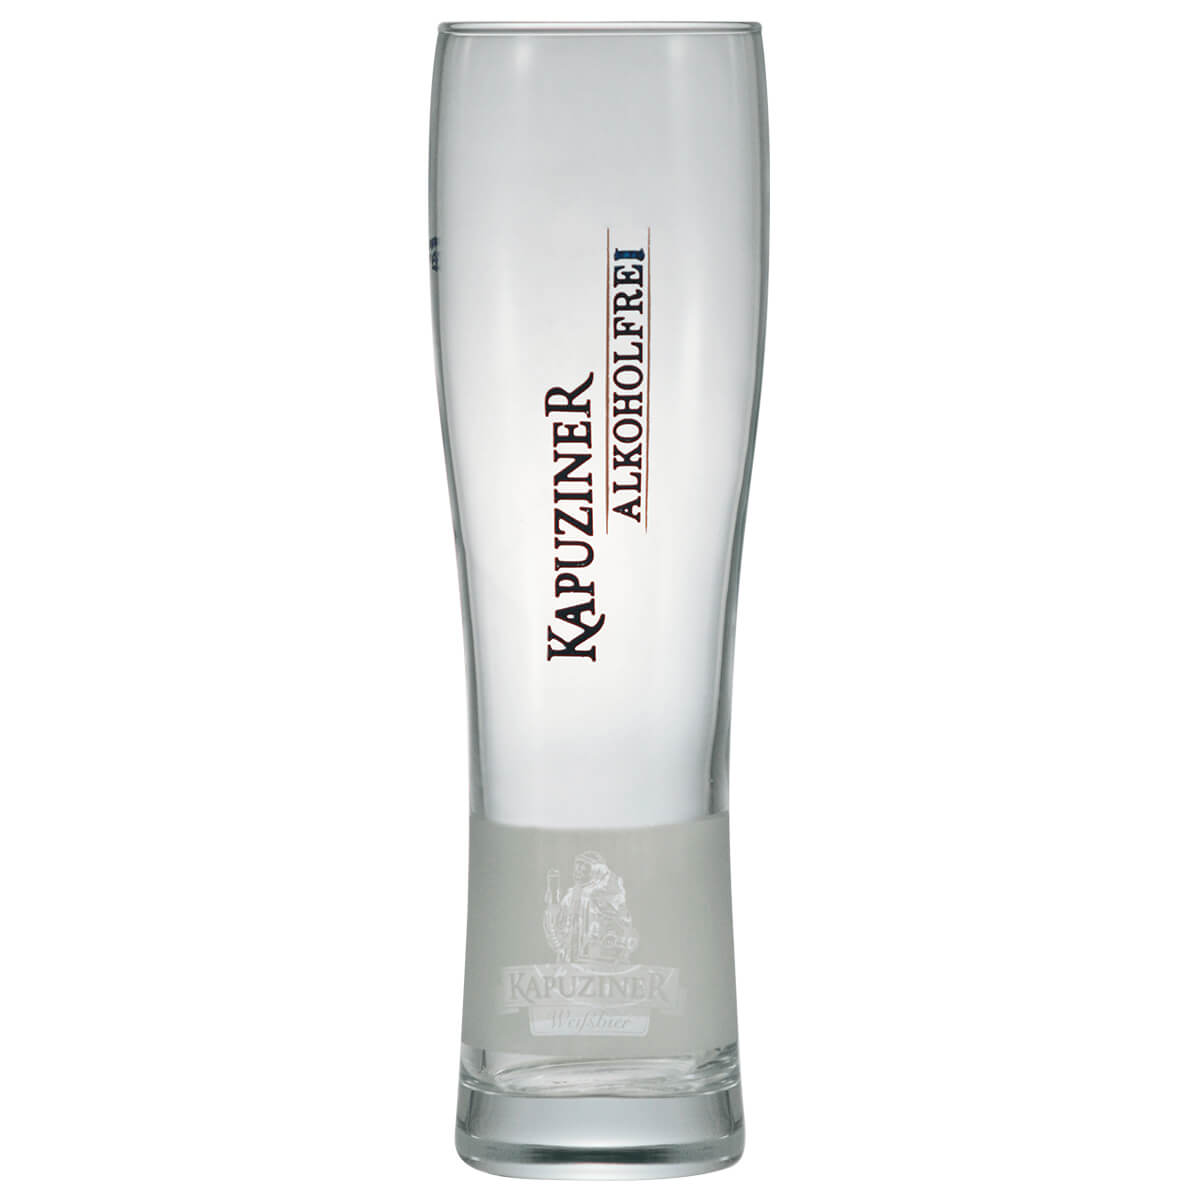 Copo de Cerveja Kapuziner 600ml